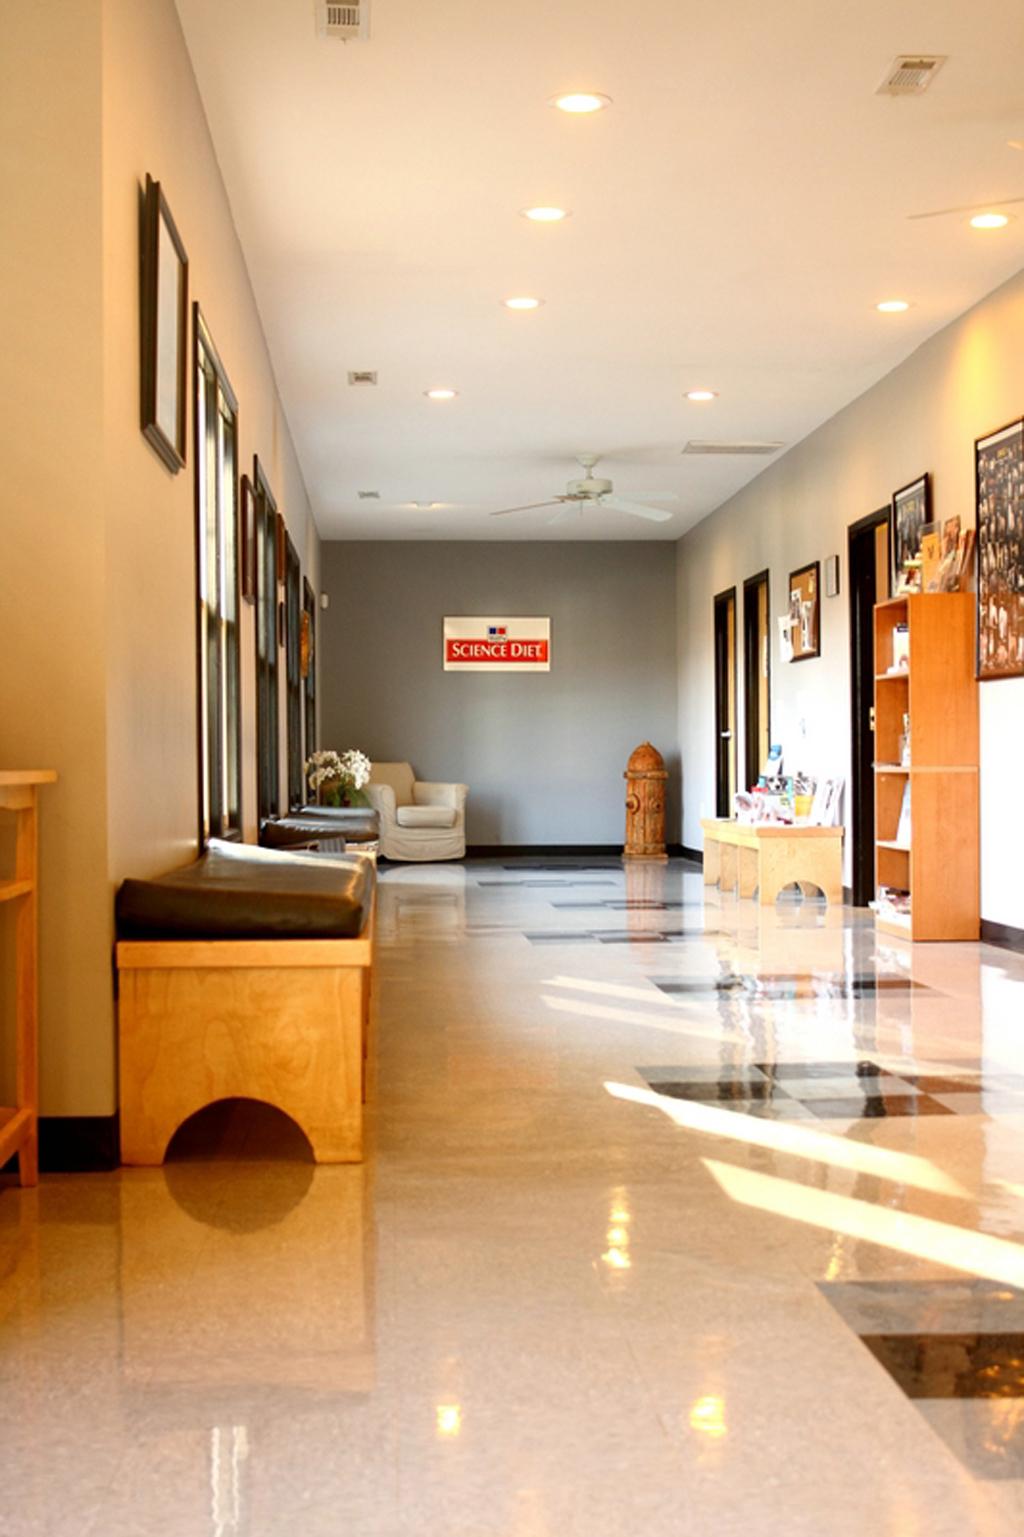 VCA Chestatee Animal Hospital image 2